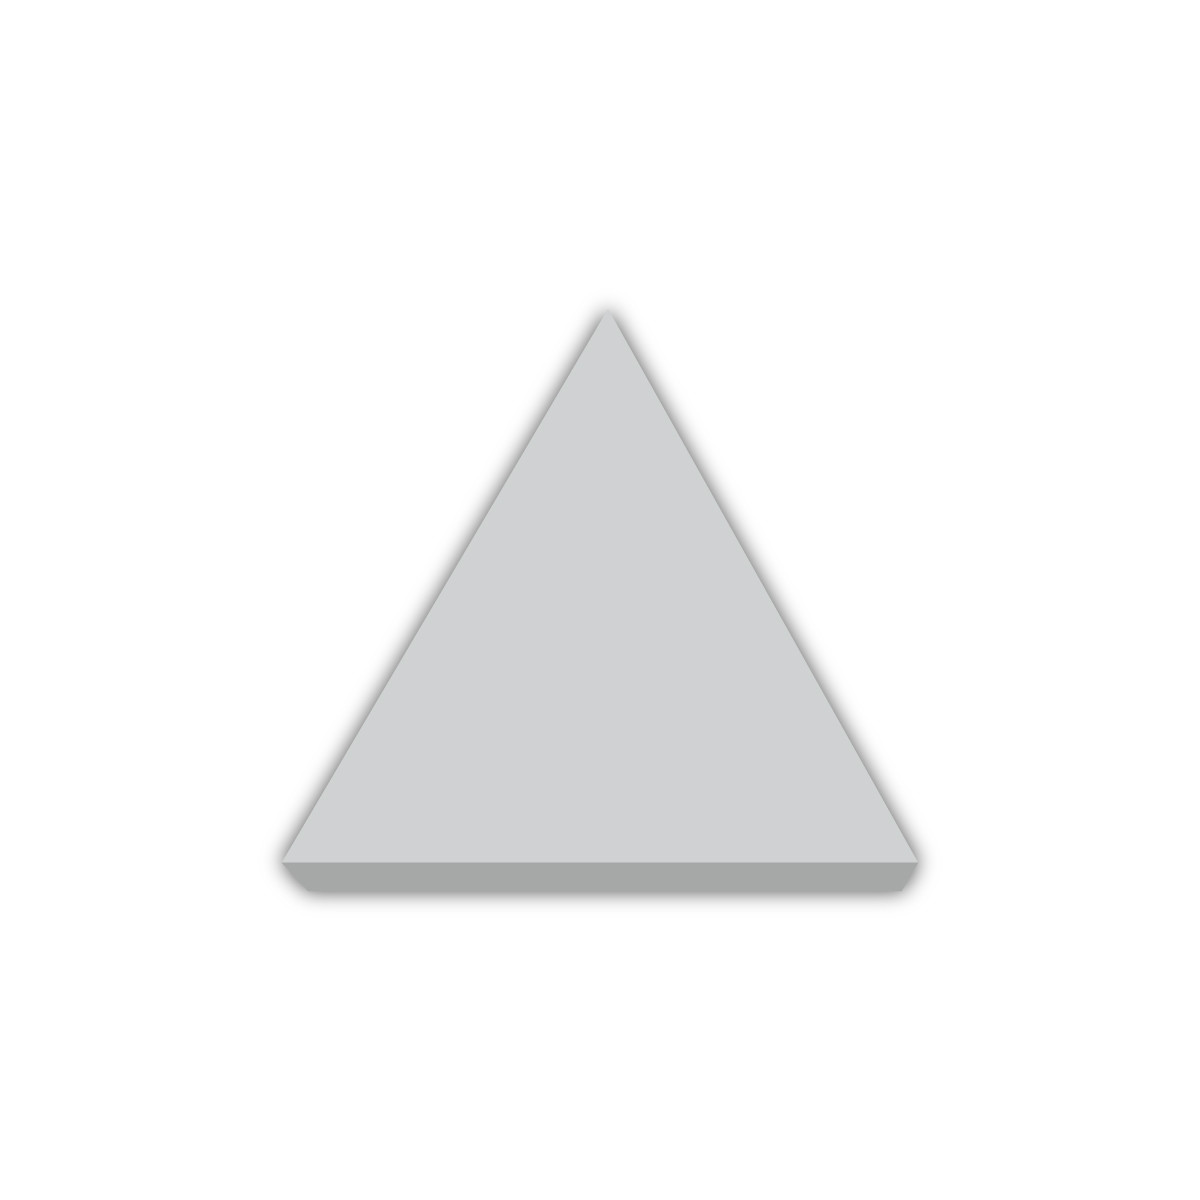 Лепнина из гипса мелочь м-35 h40мм